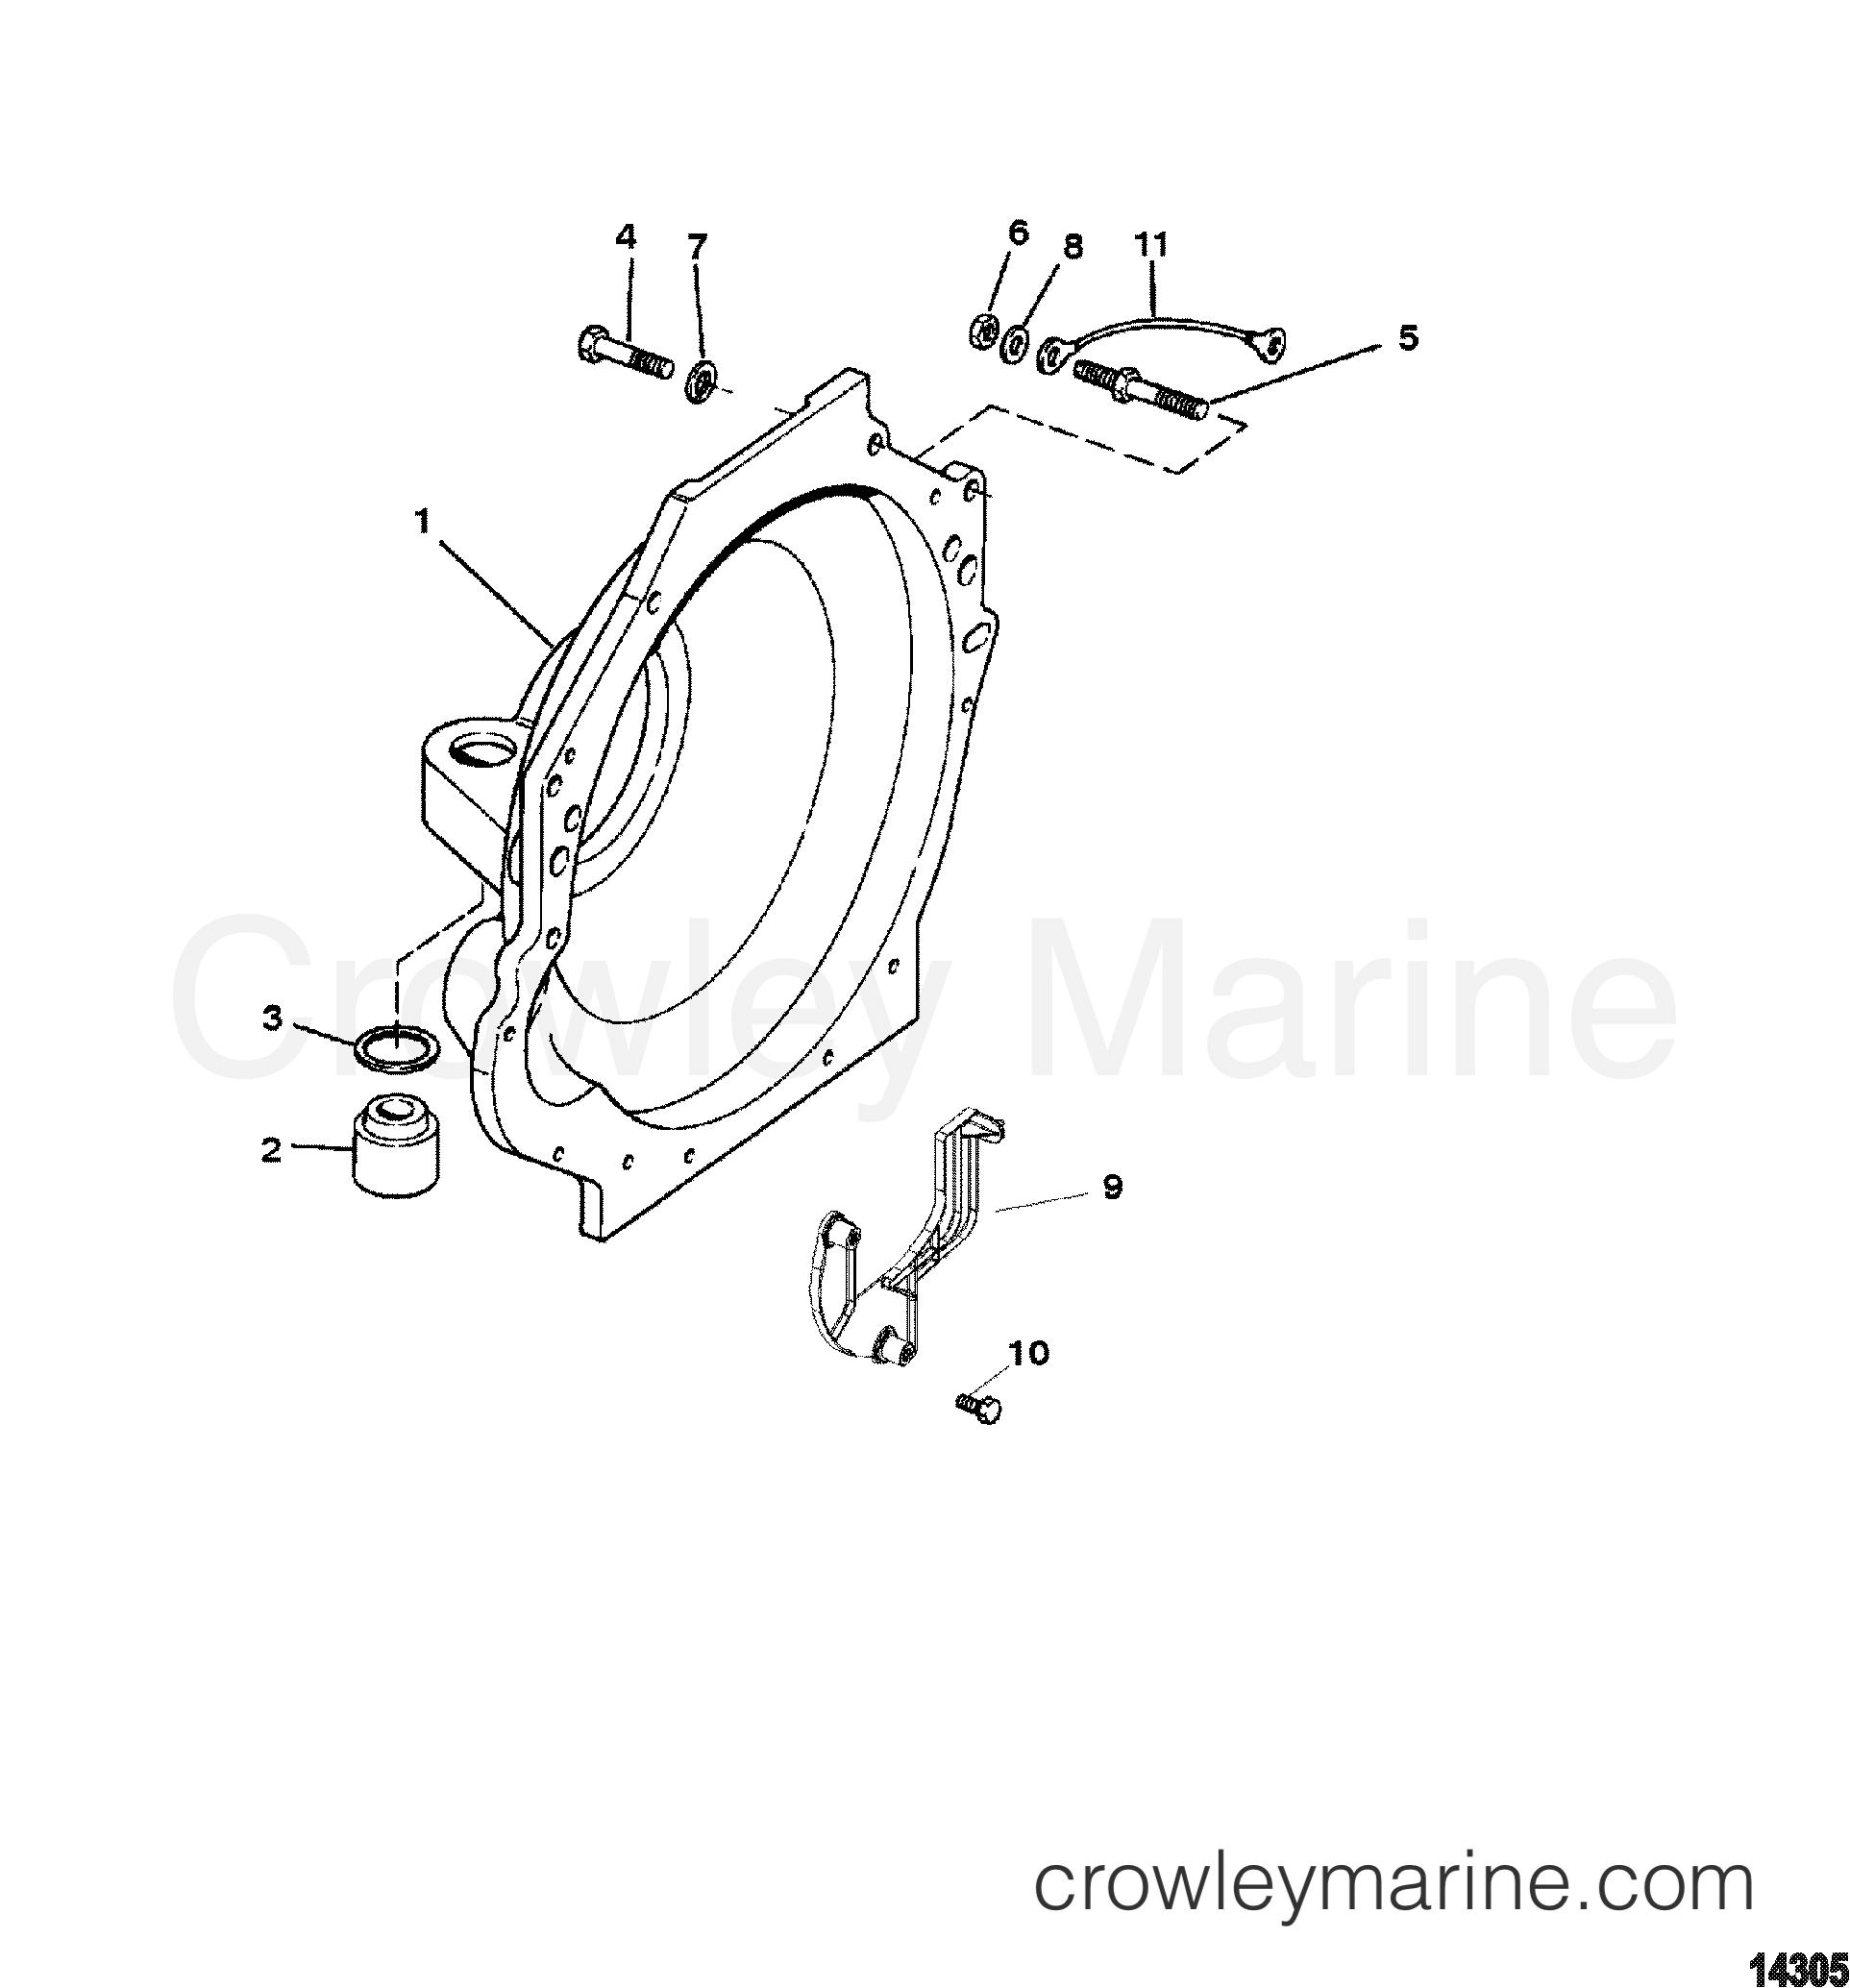 1996 mercruiser 4 3lx [alpha] - 443lc00jt - flywheel housing section